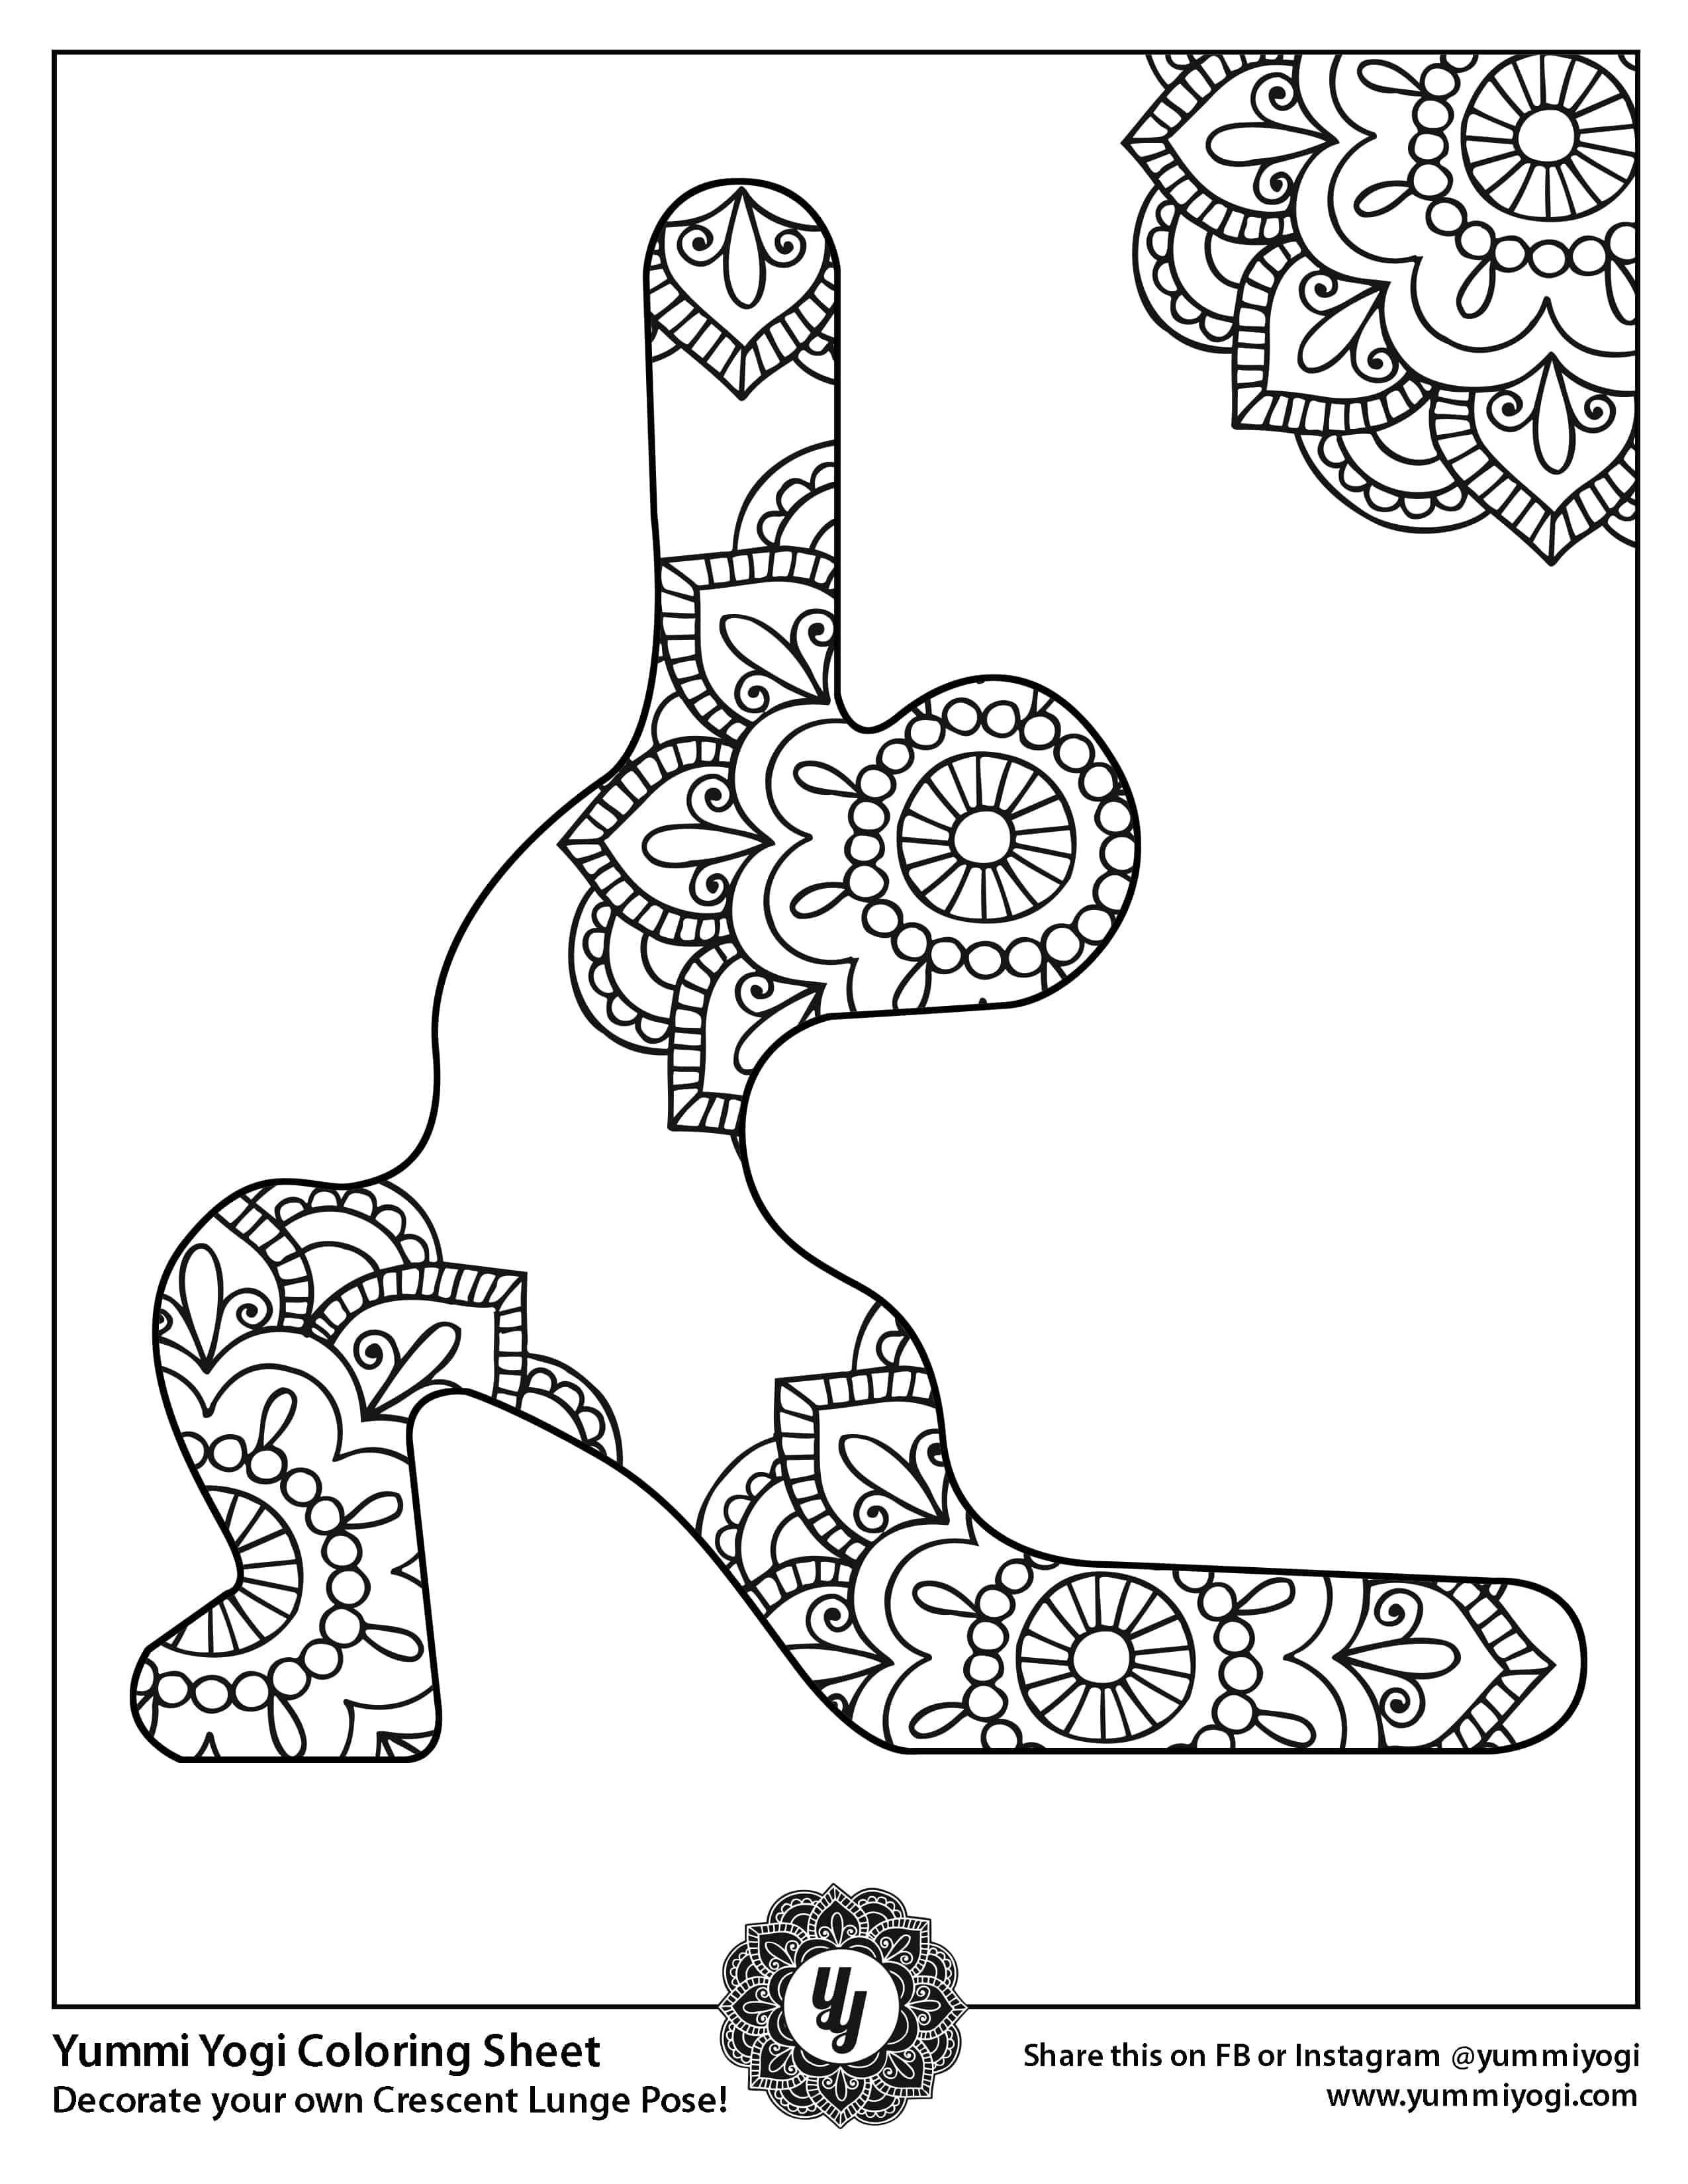 Free Printable Yoga Coloring Page Yummi Yogi